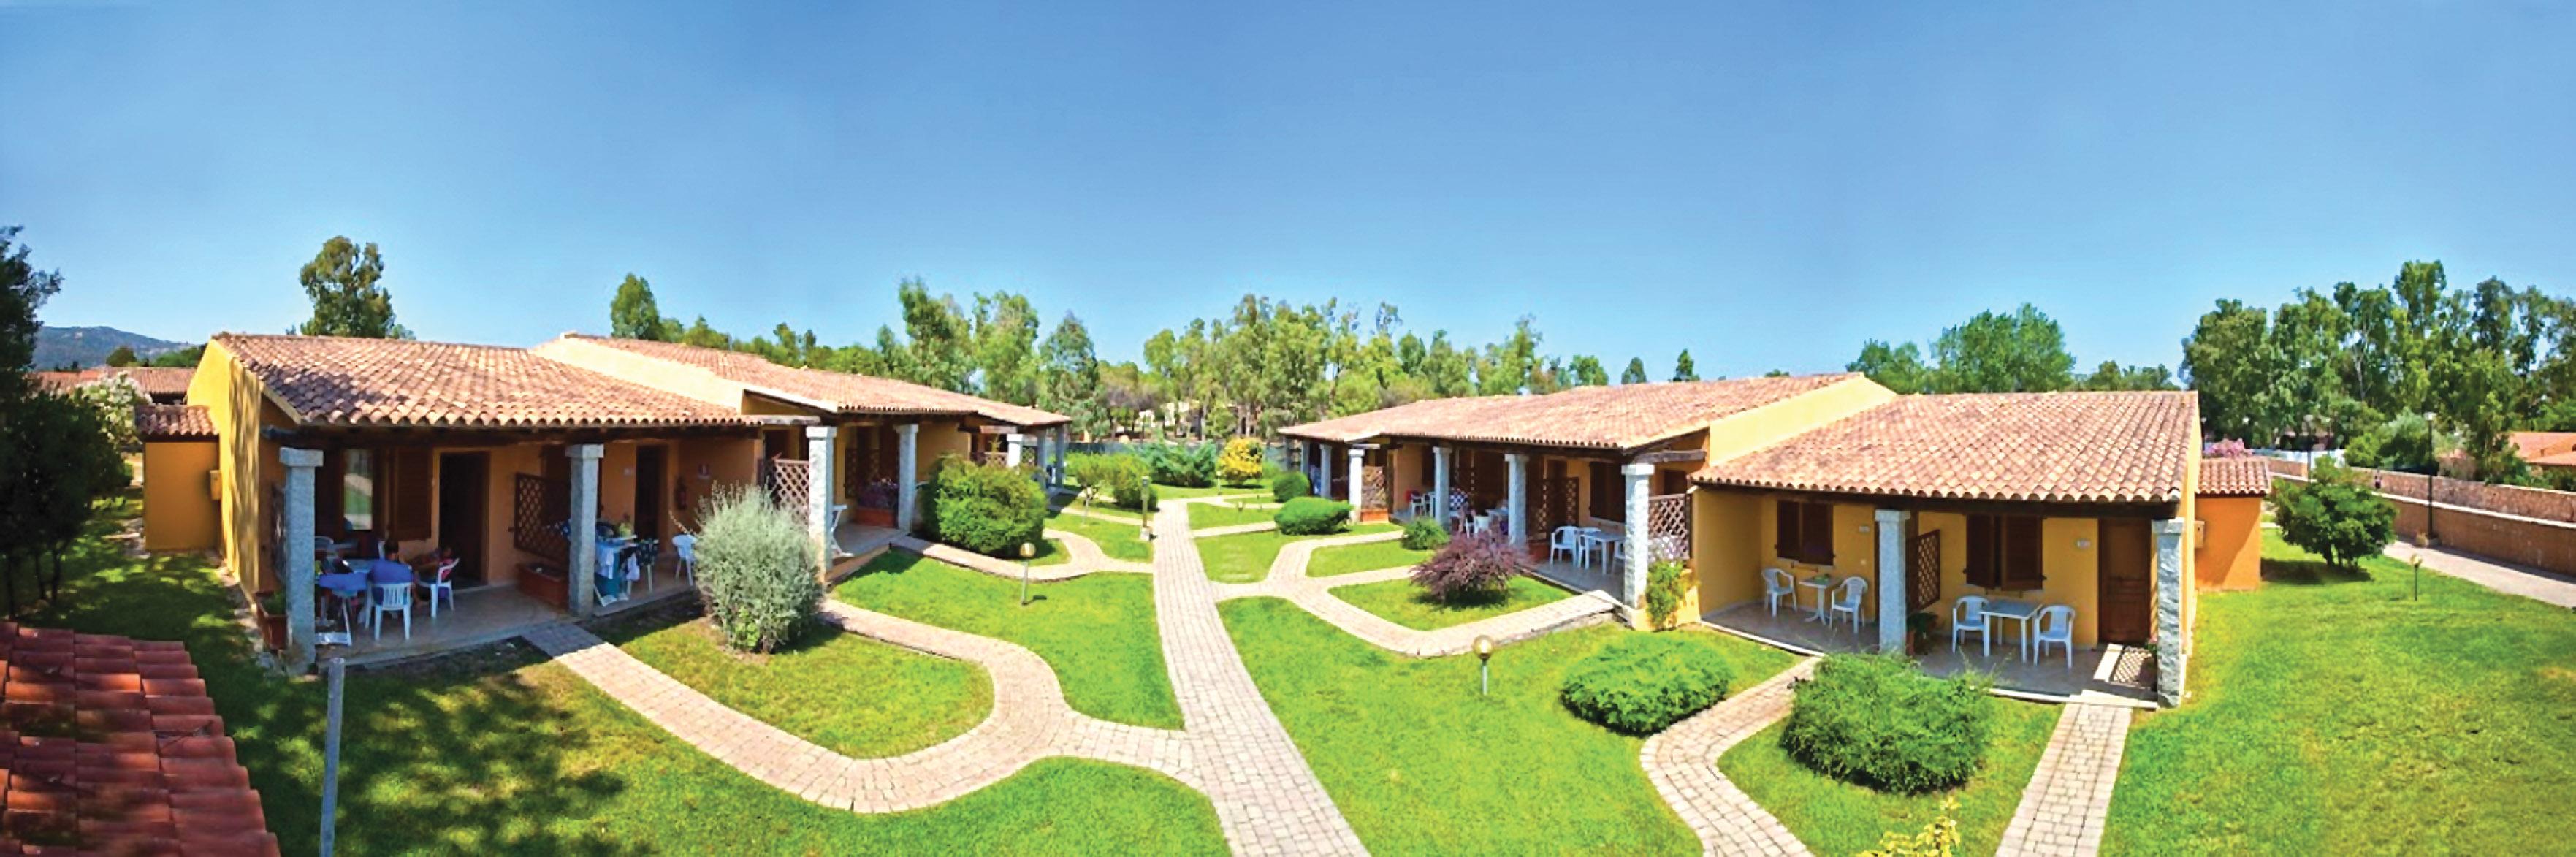 Club Hotel Eurovillage - Agrustos - Budoni - Sardaigne ...